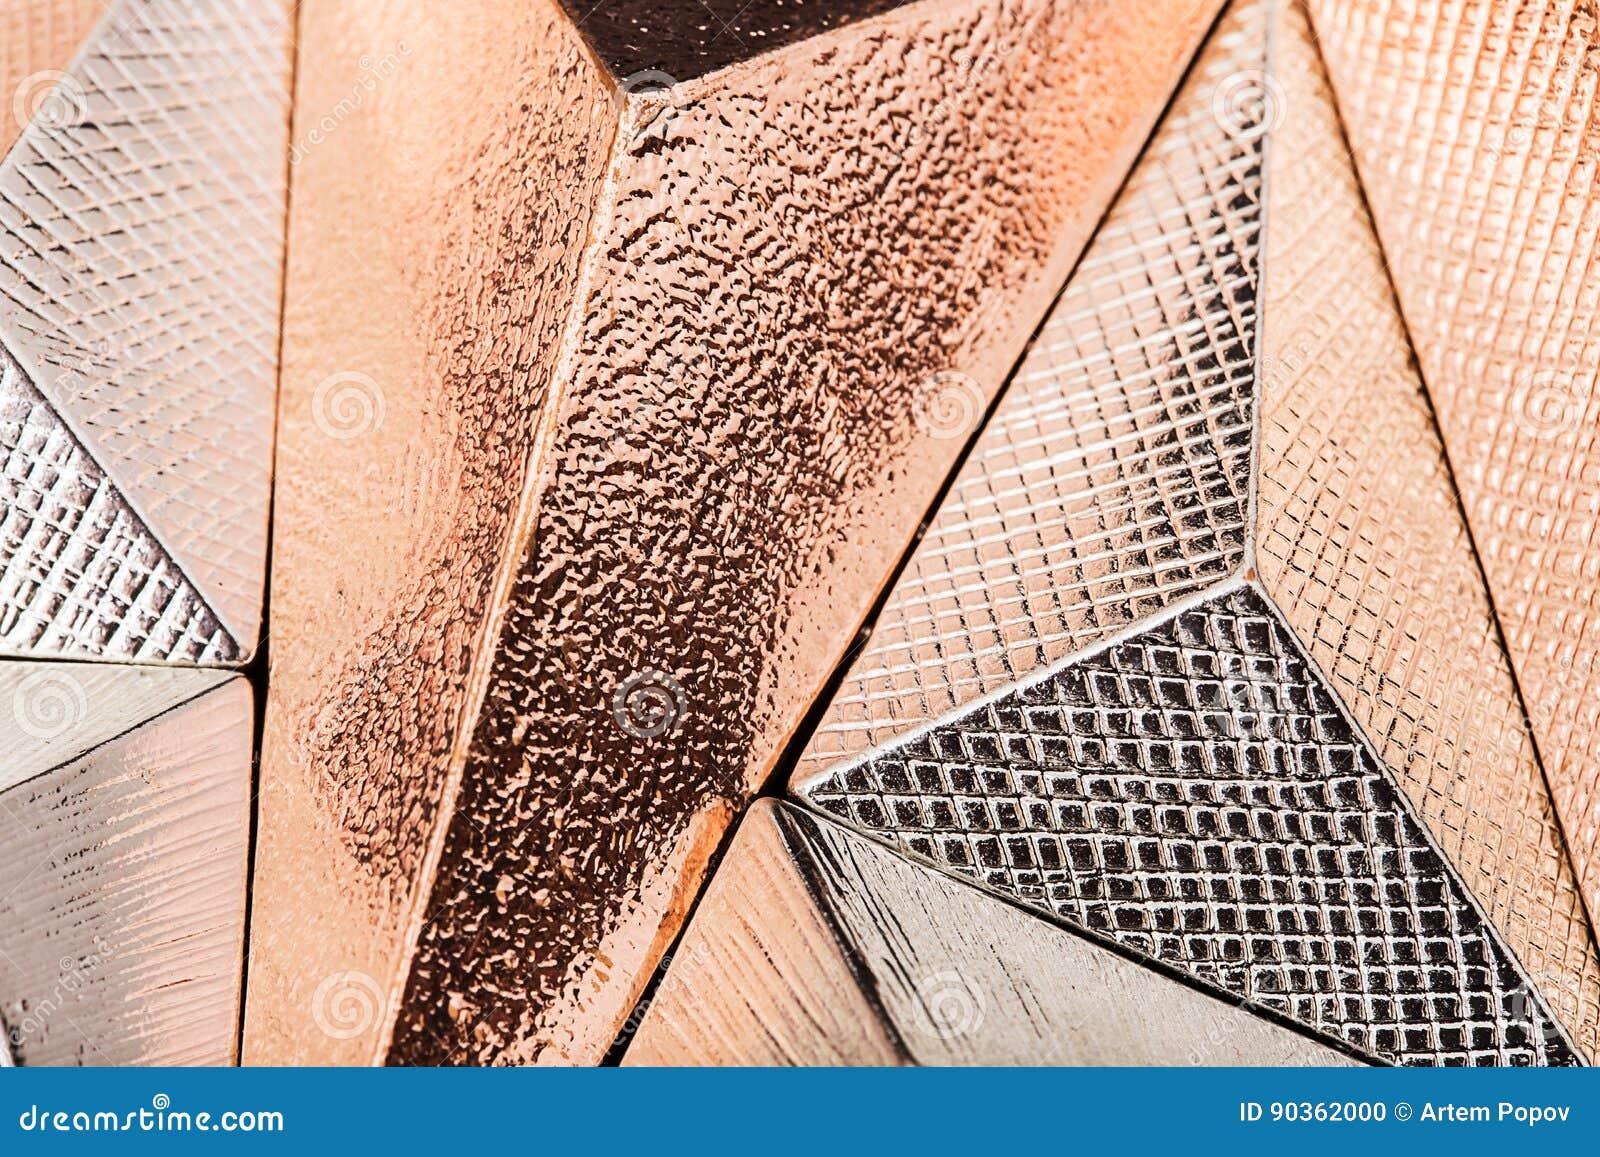 Three dimensional geometric metal shapes